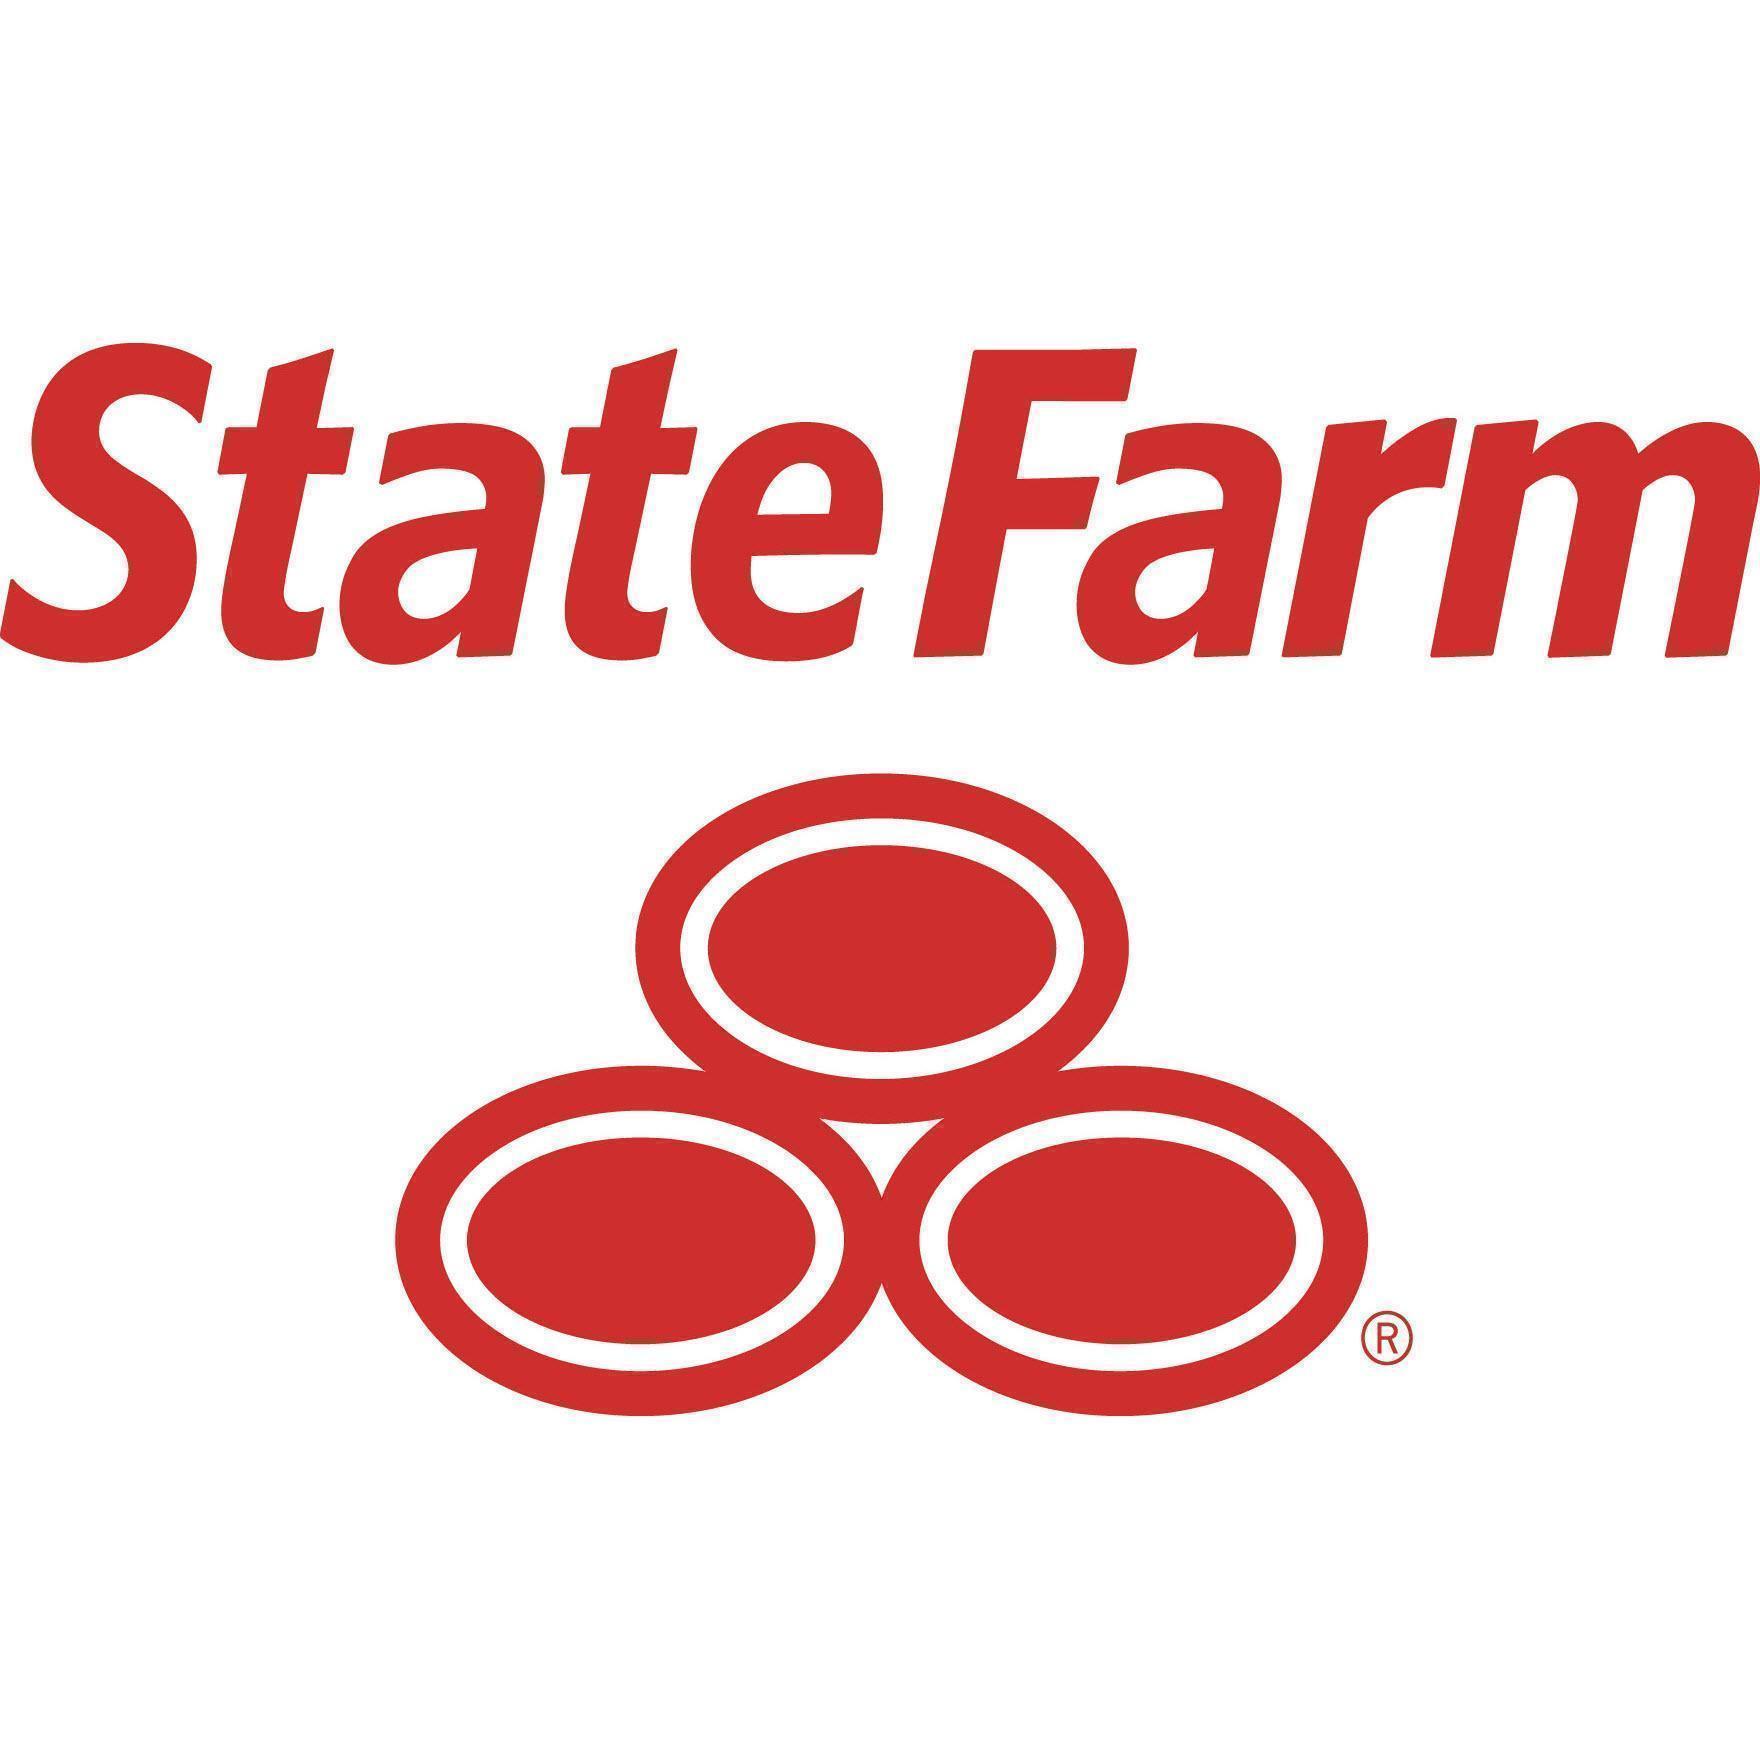 Clay Stewart - State Farm Insurance Agent